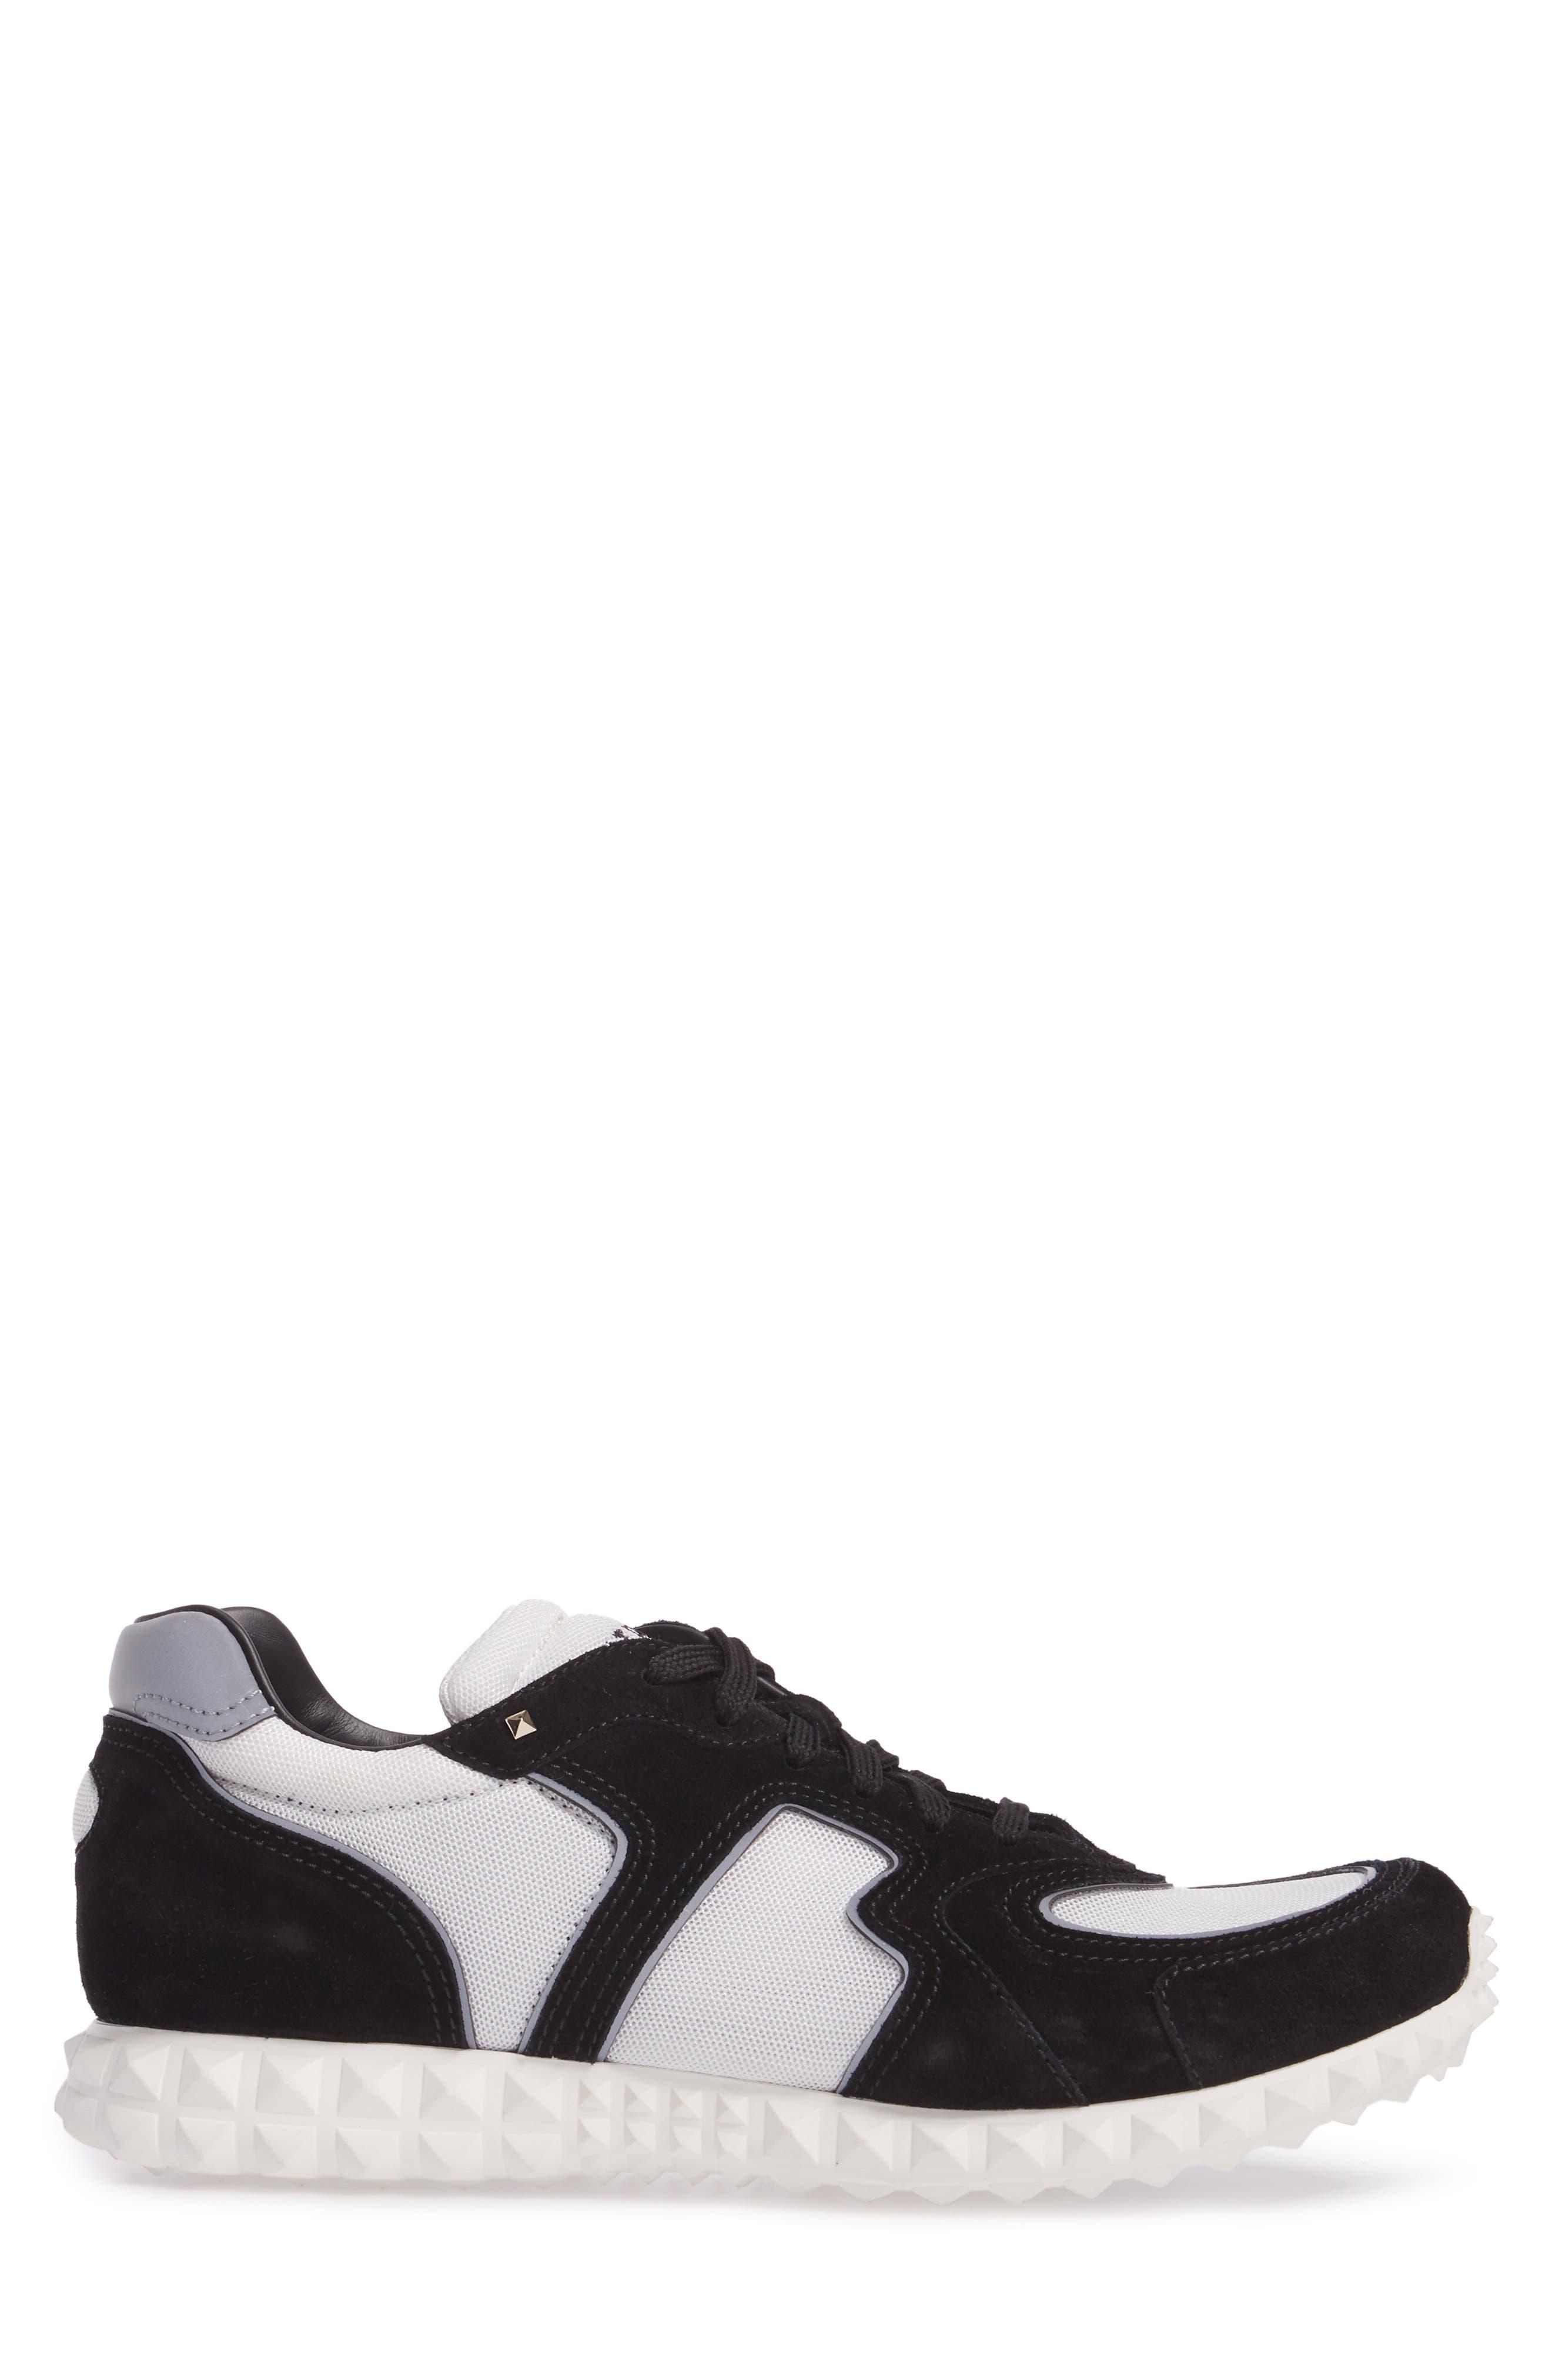 Soul AM Sneaker,                             Alternate thumbnail 3, color,                             103